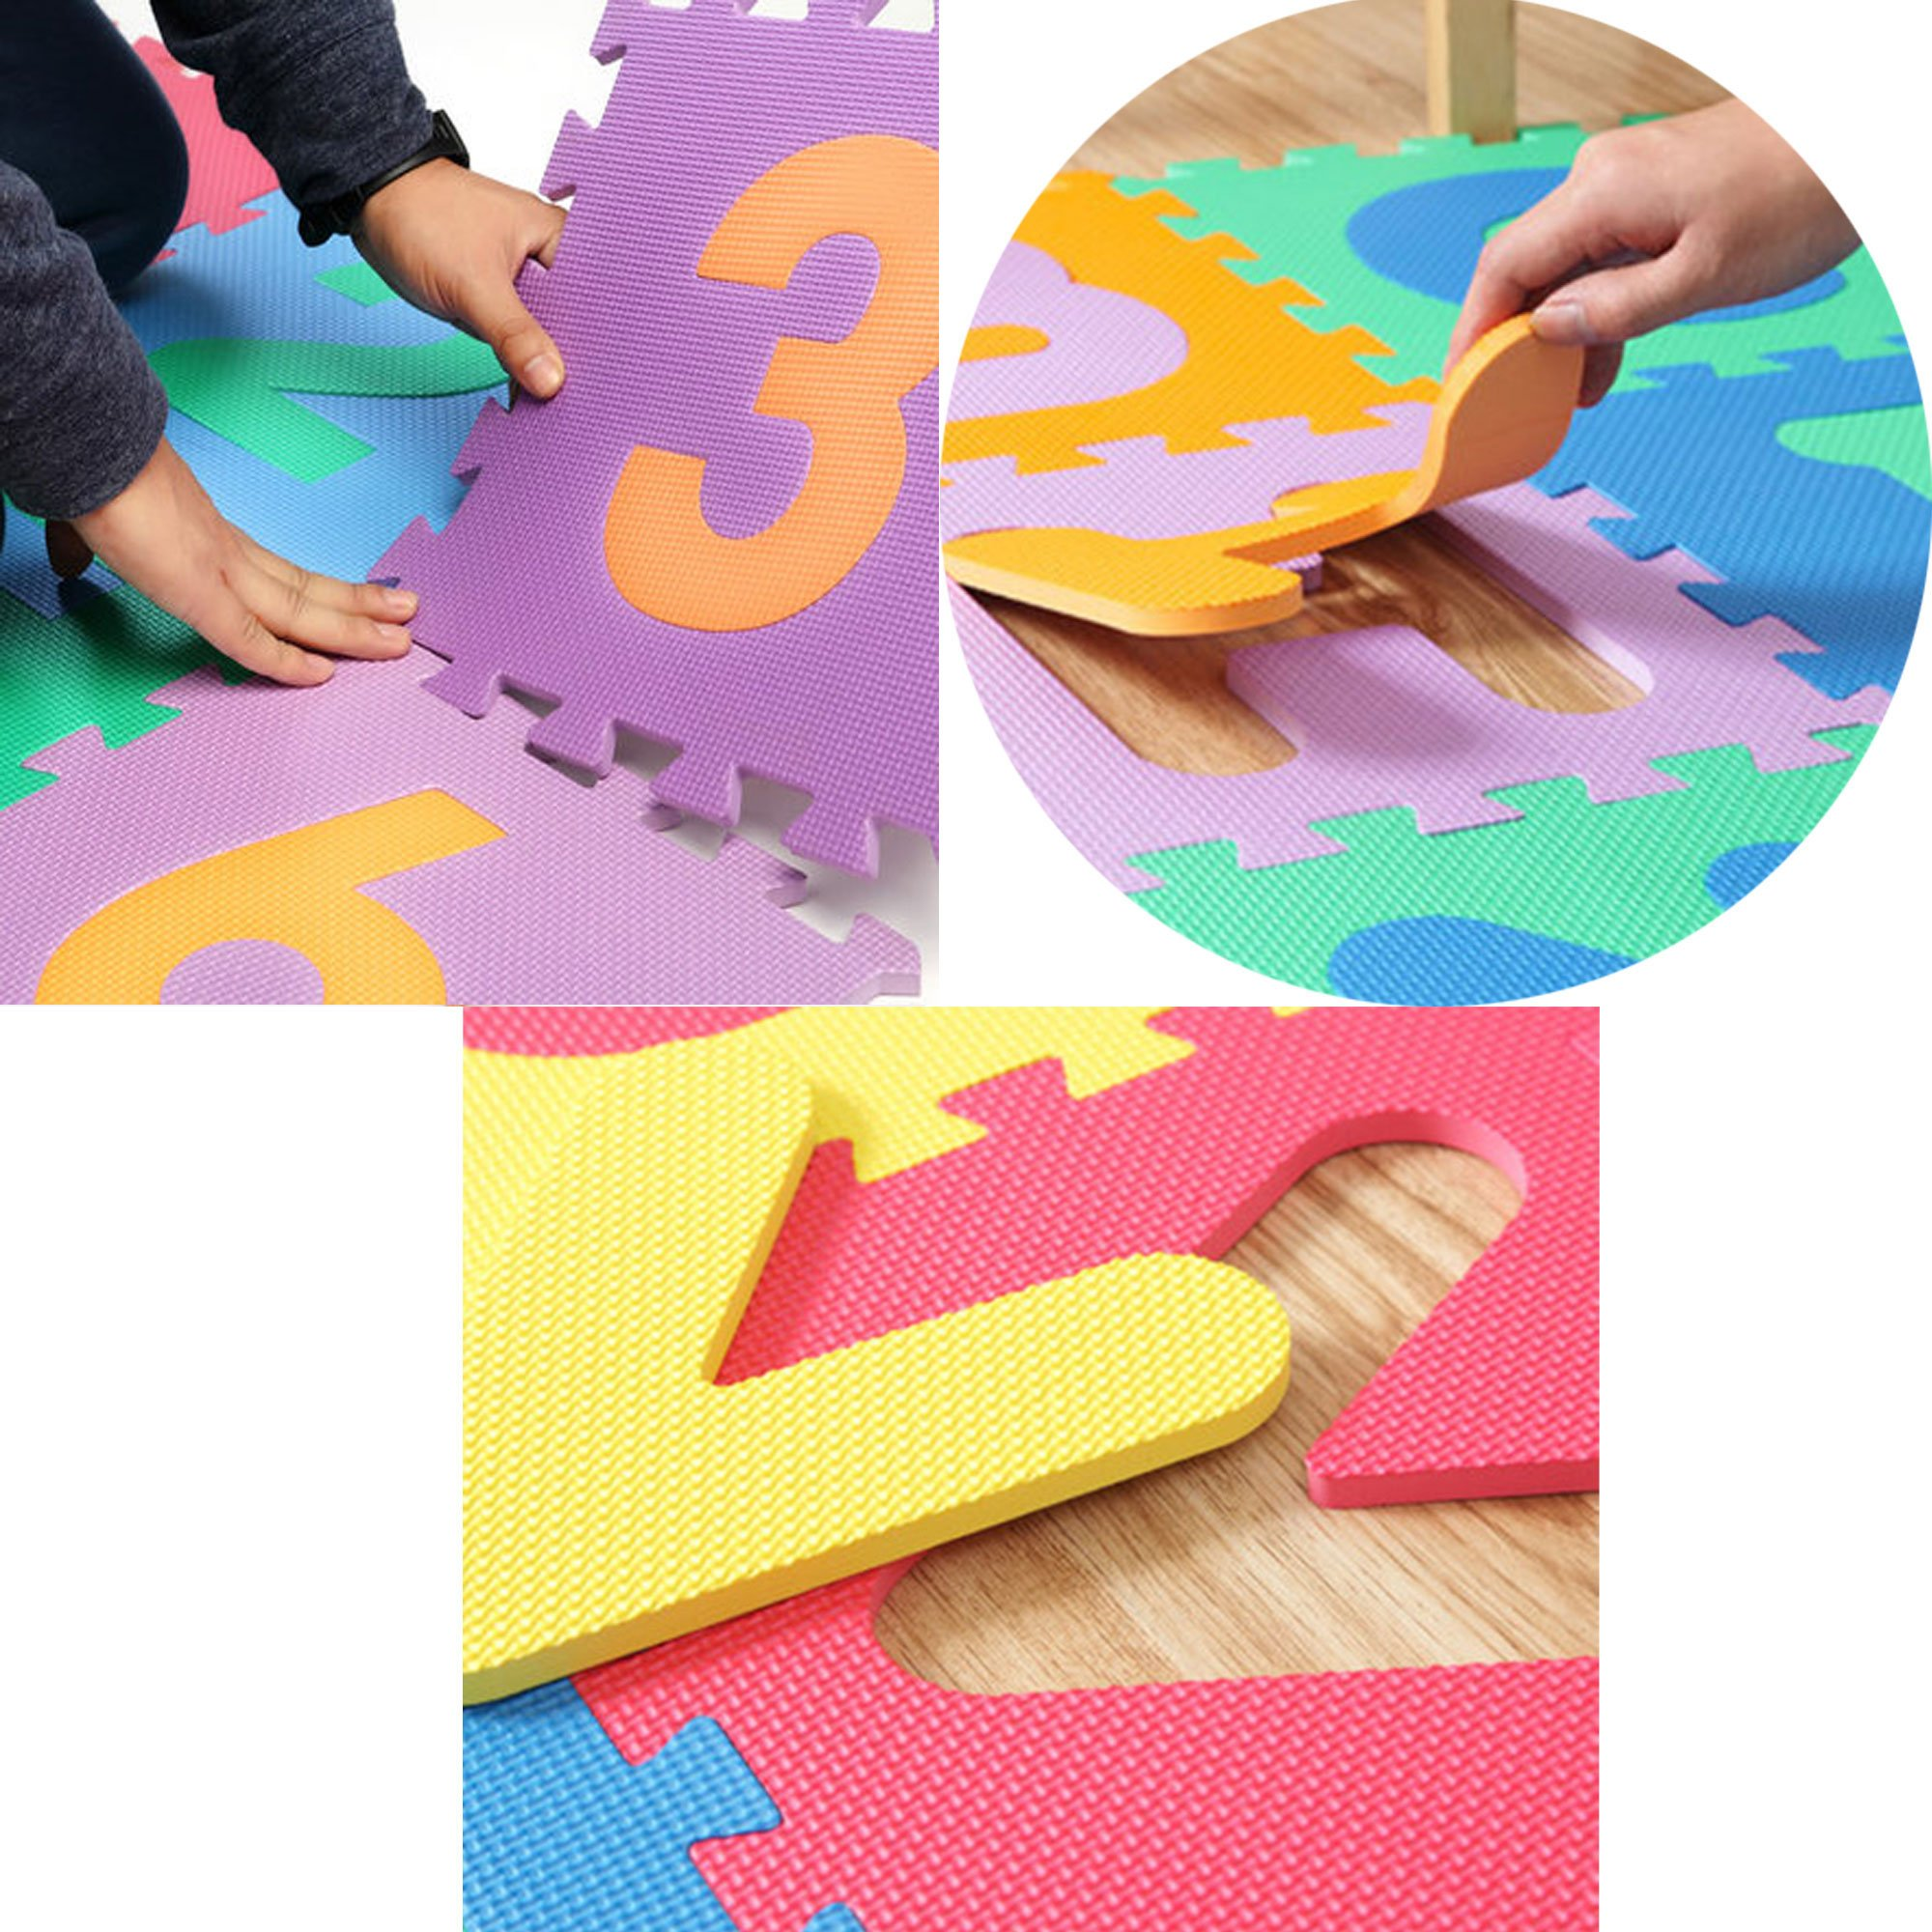 Puzzle Play Mat,Foam Floor Play Mat,Foam Interlocking Tiles,Alphabet & Number Foam Puzzle Mat,NON-TOXIC EVA 36 Piece Multi-Color Children Play & Exercise Mat (Large) (Large) by Chuanyue (Image #6)